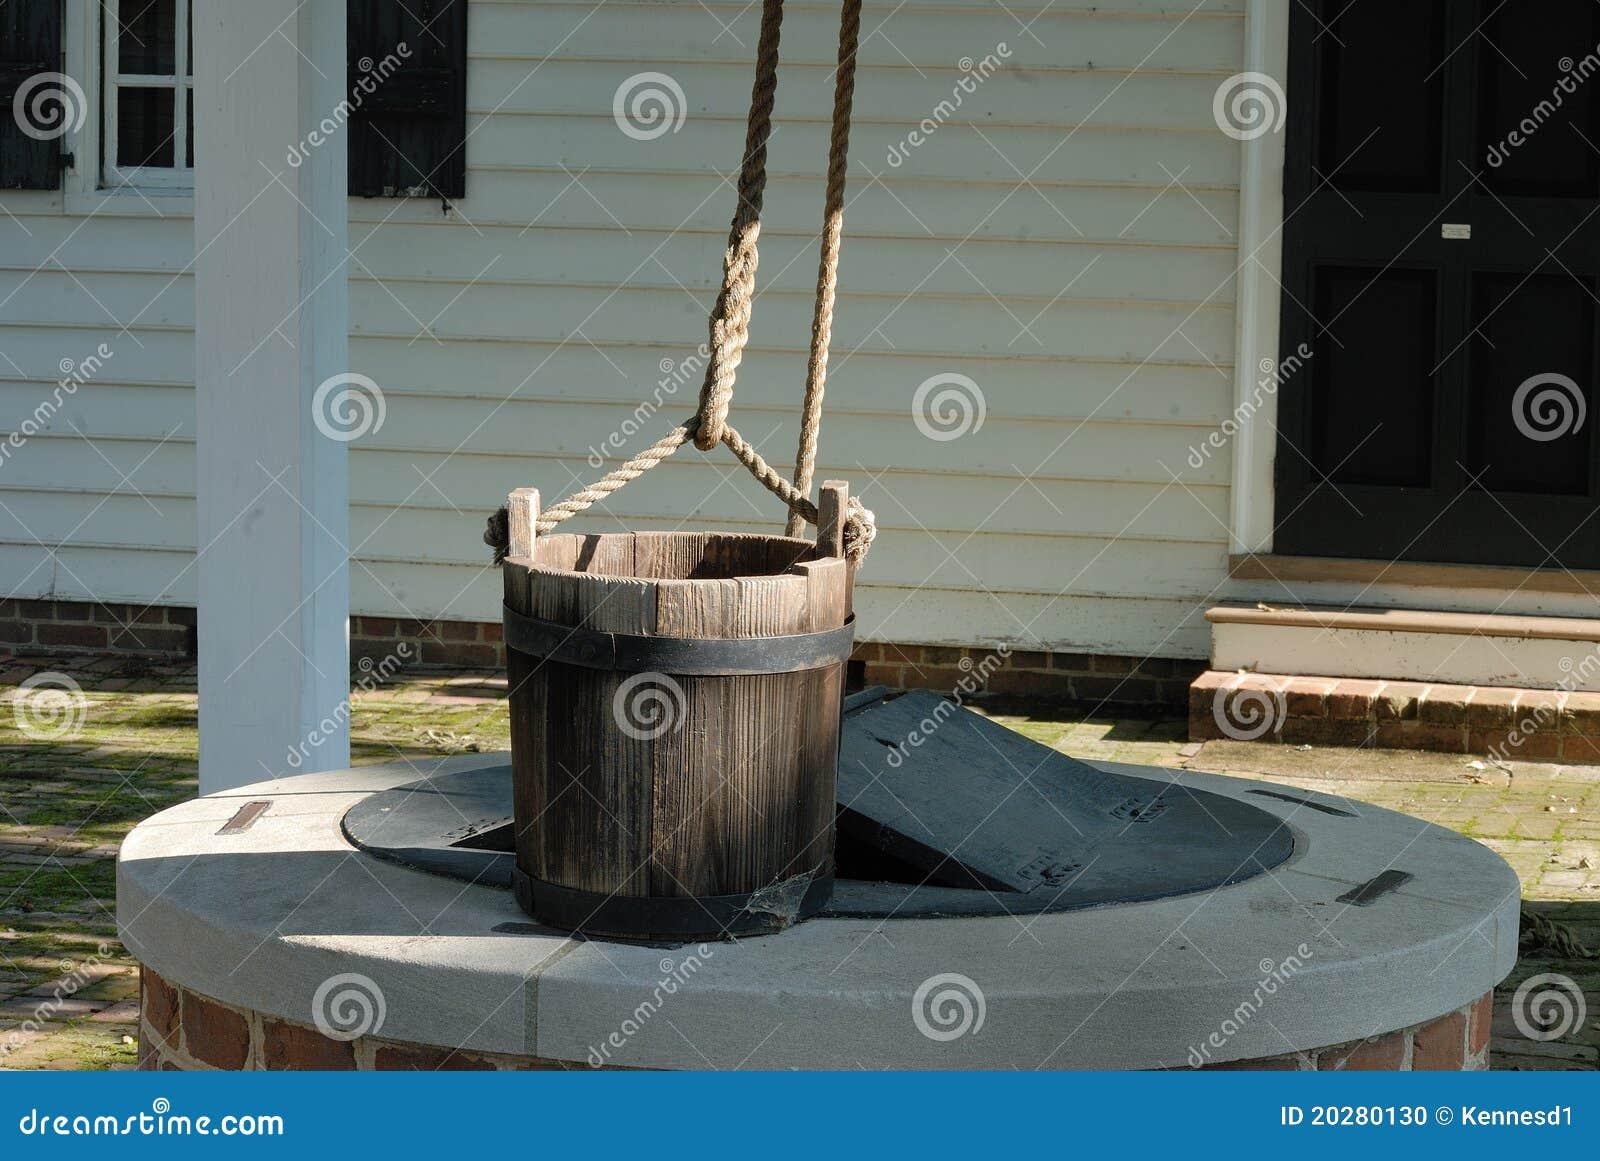 Well water bucket